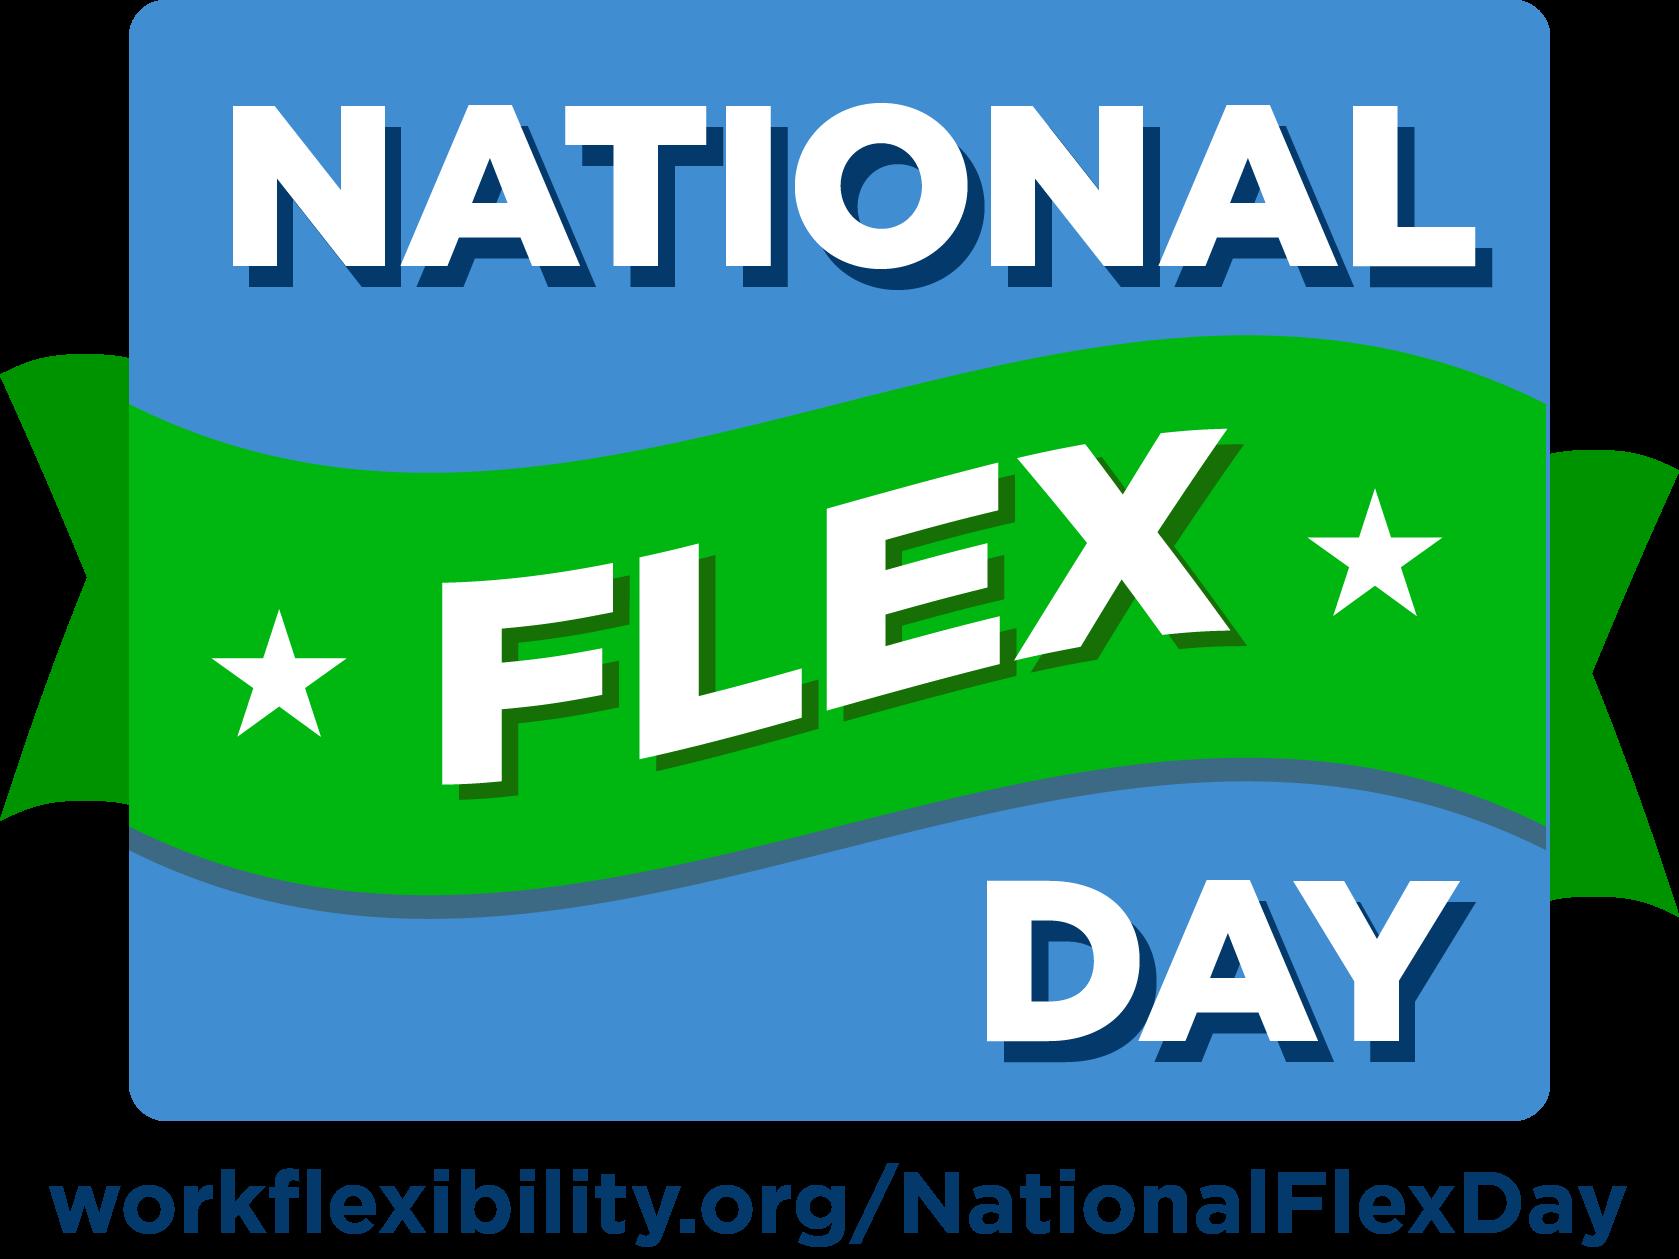 national flex day 1 million for work flexibility